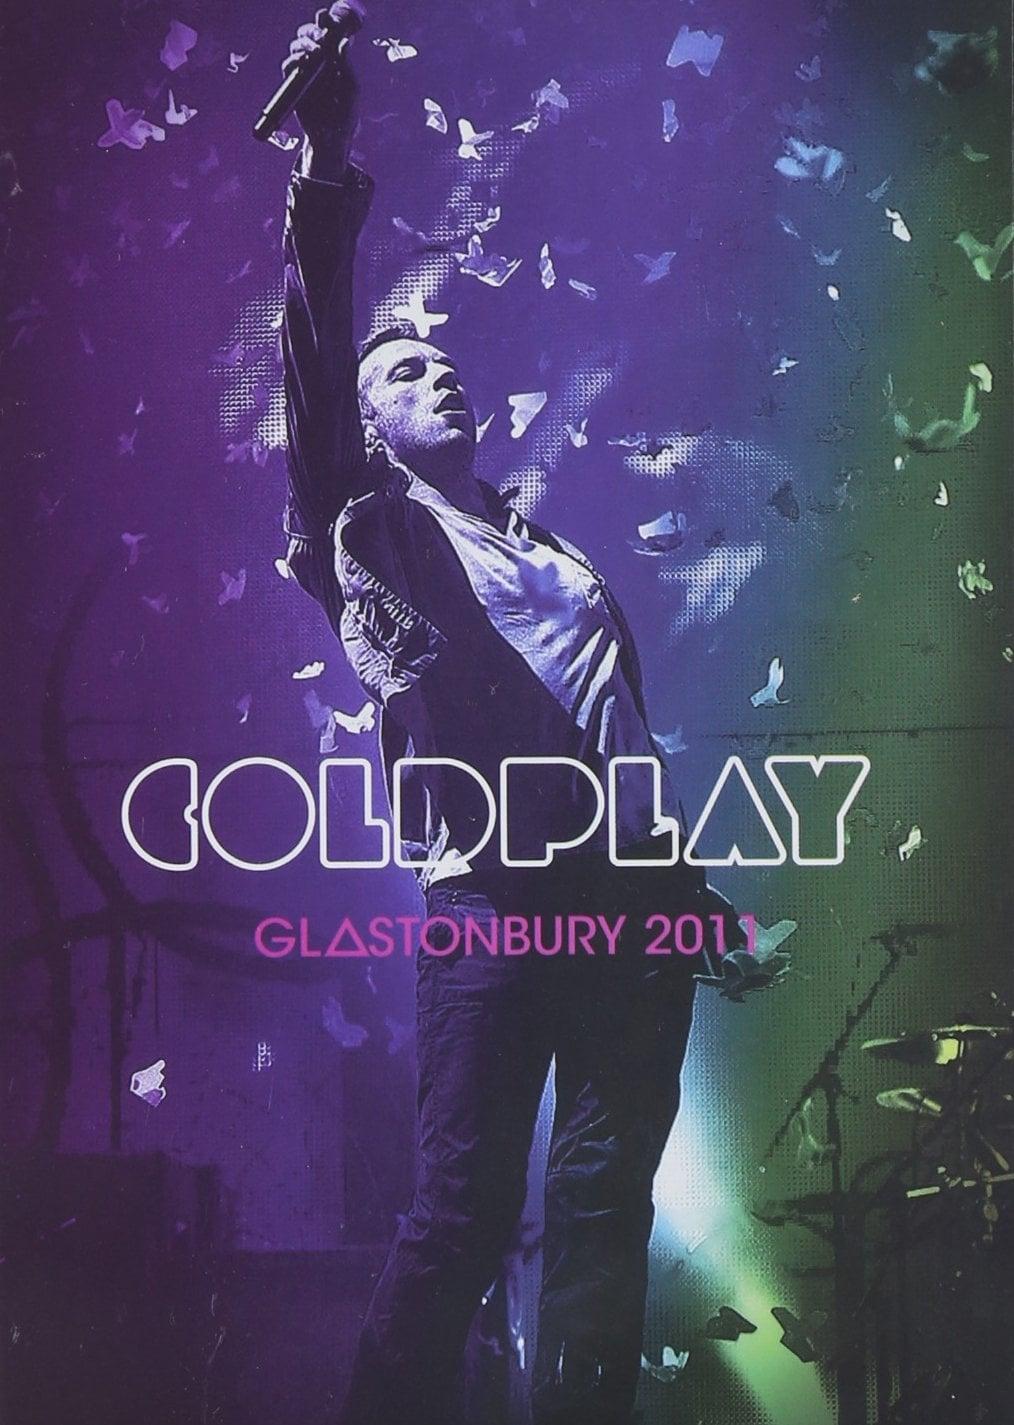 Coldplay: Live at Glastonbury 2011